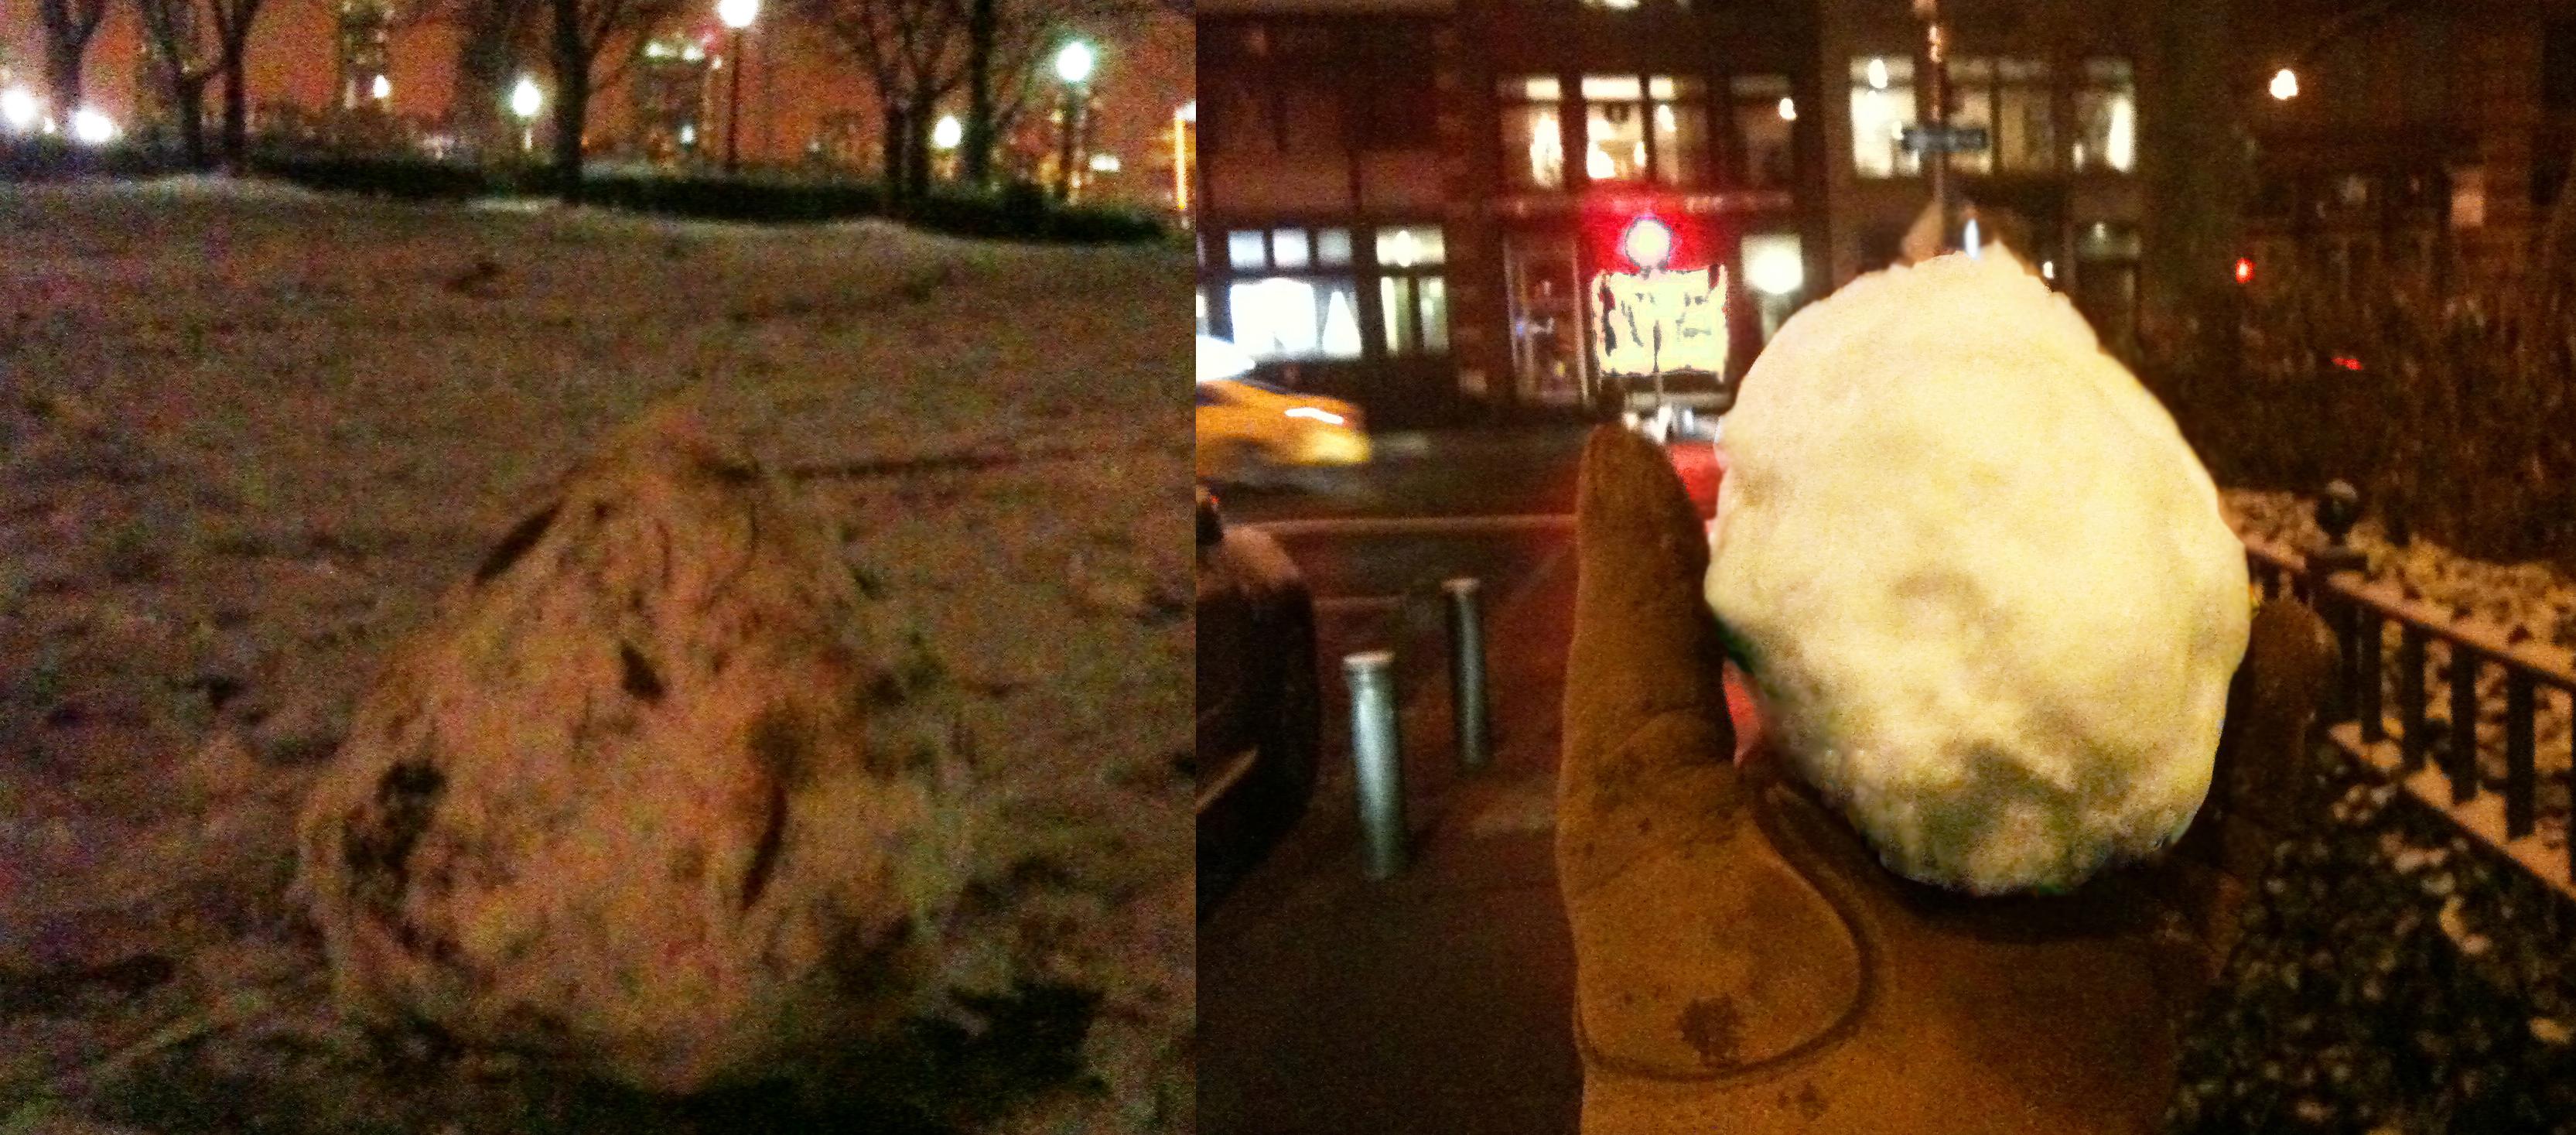 2 snowballs